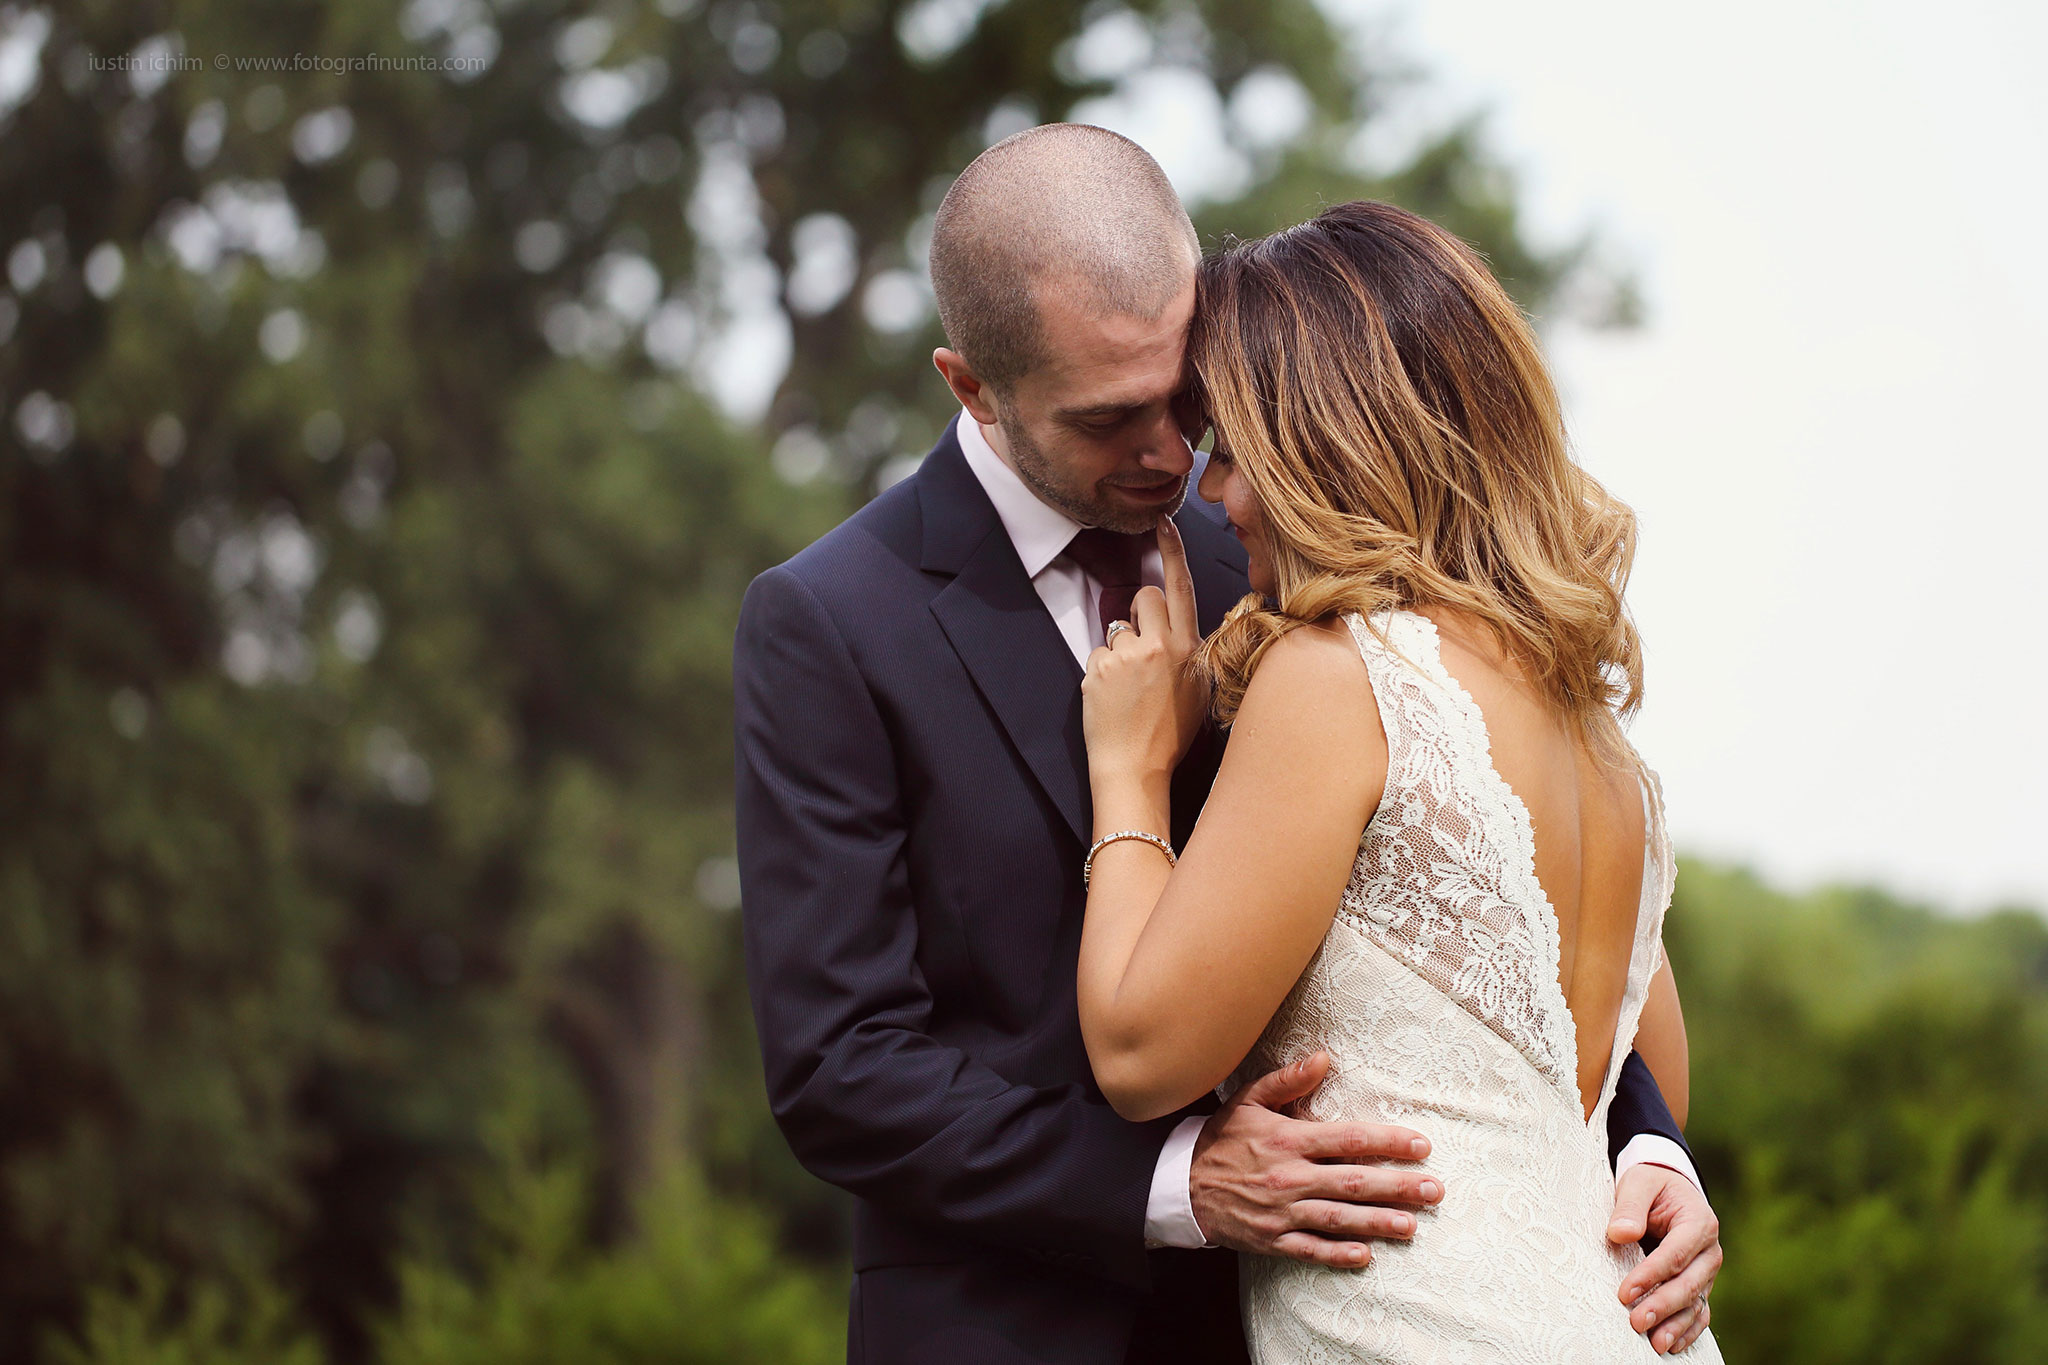 Fotograf nunta, Sesiune foto in ziua nuntii